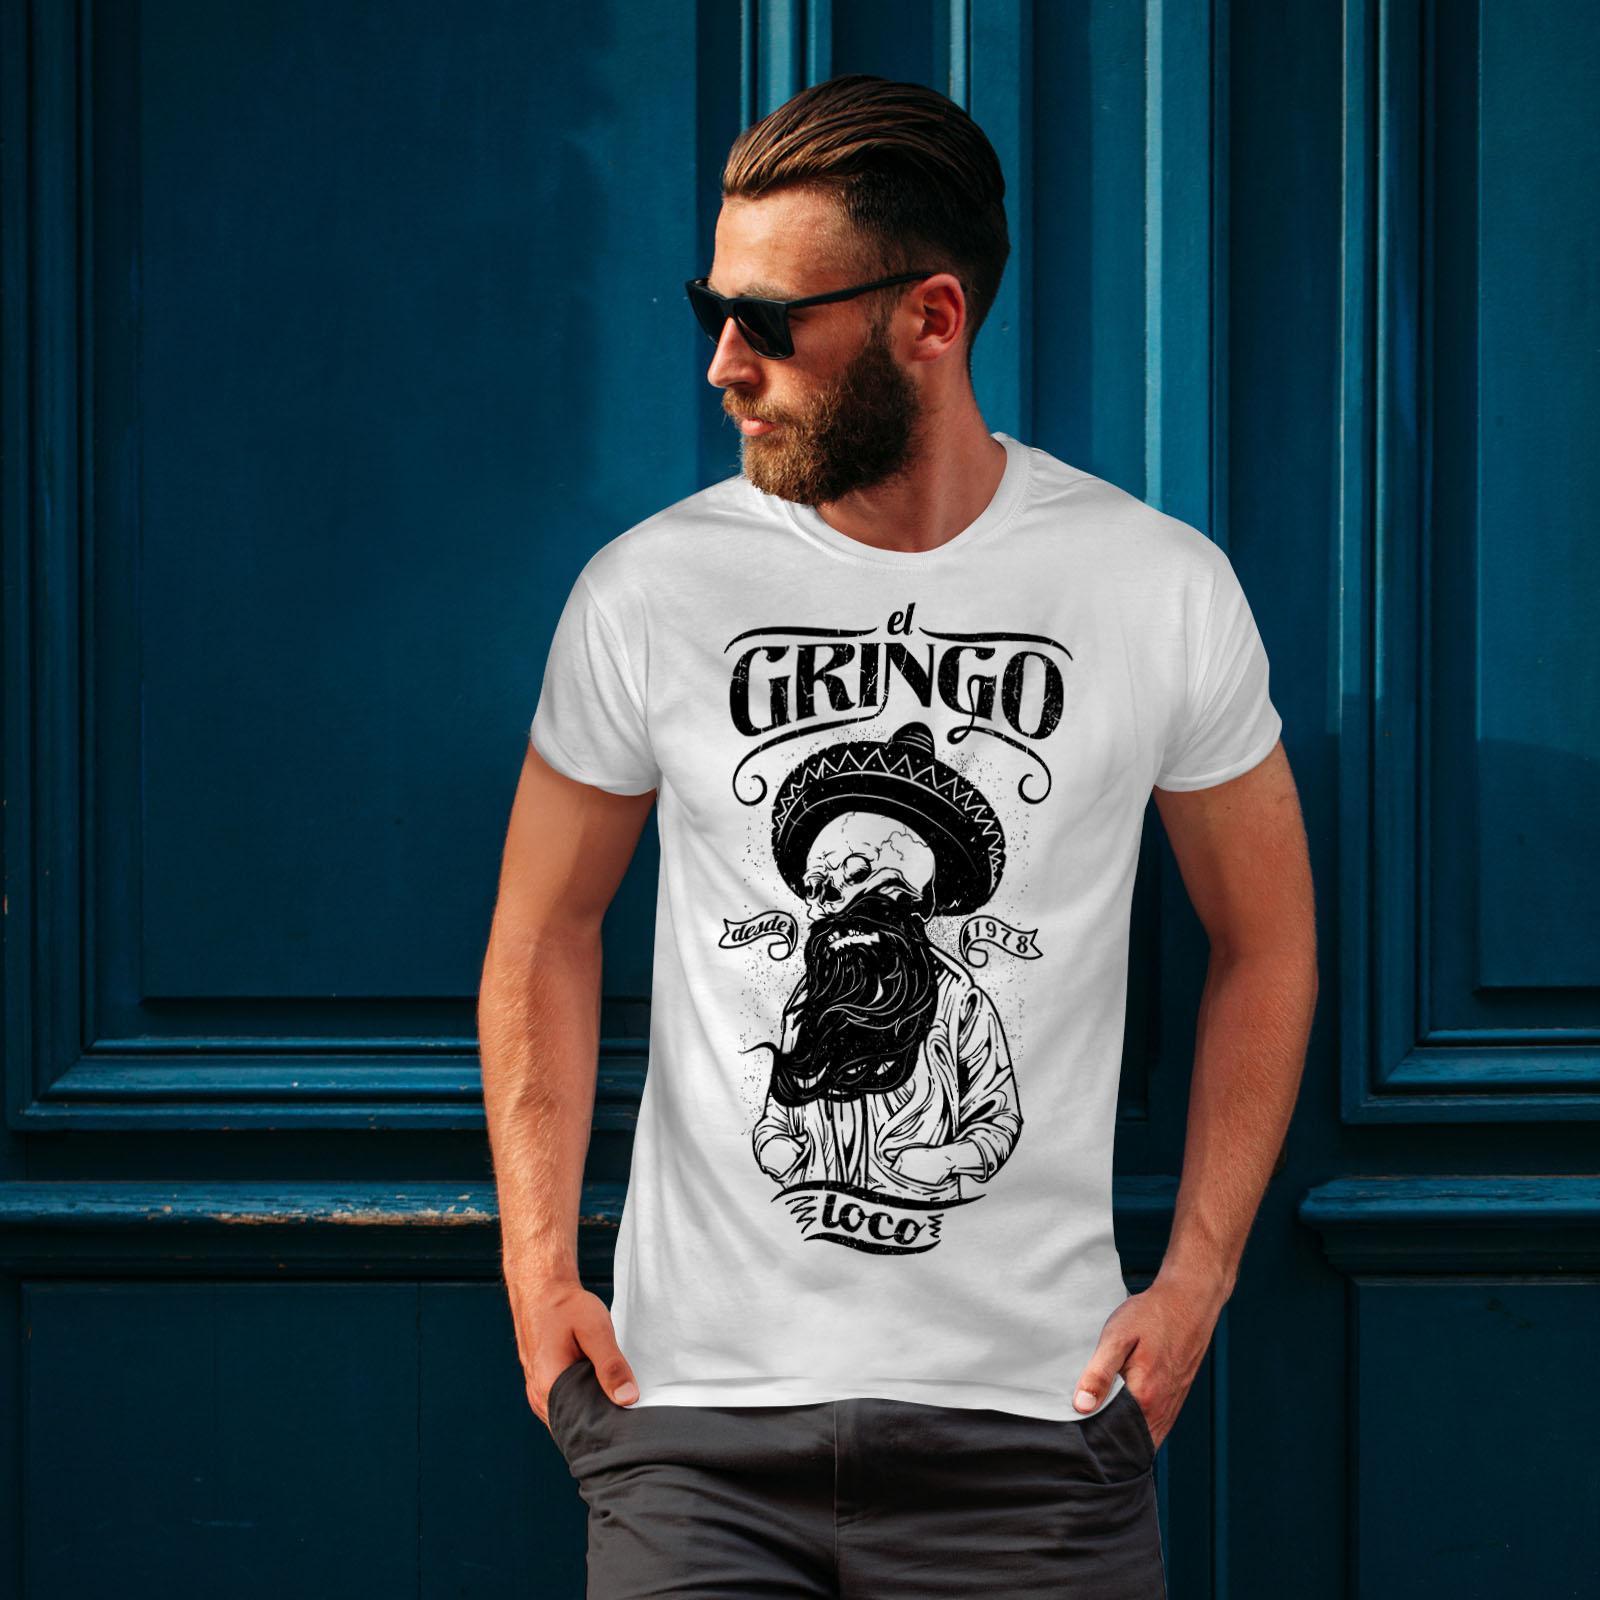 Wellcoda-Gringo-Beard-Skull-Mens-T-shirt-Mexico-Graphic-Design-Printed-Tee thumbnail 10